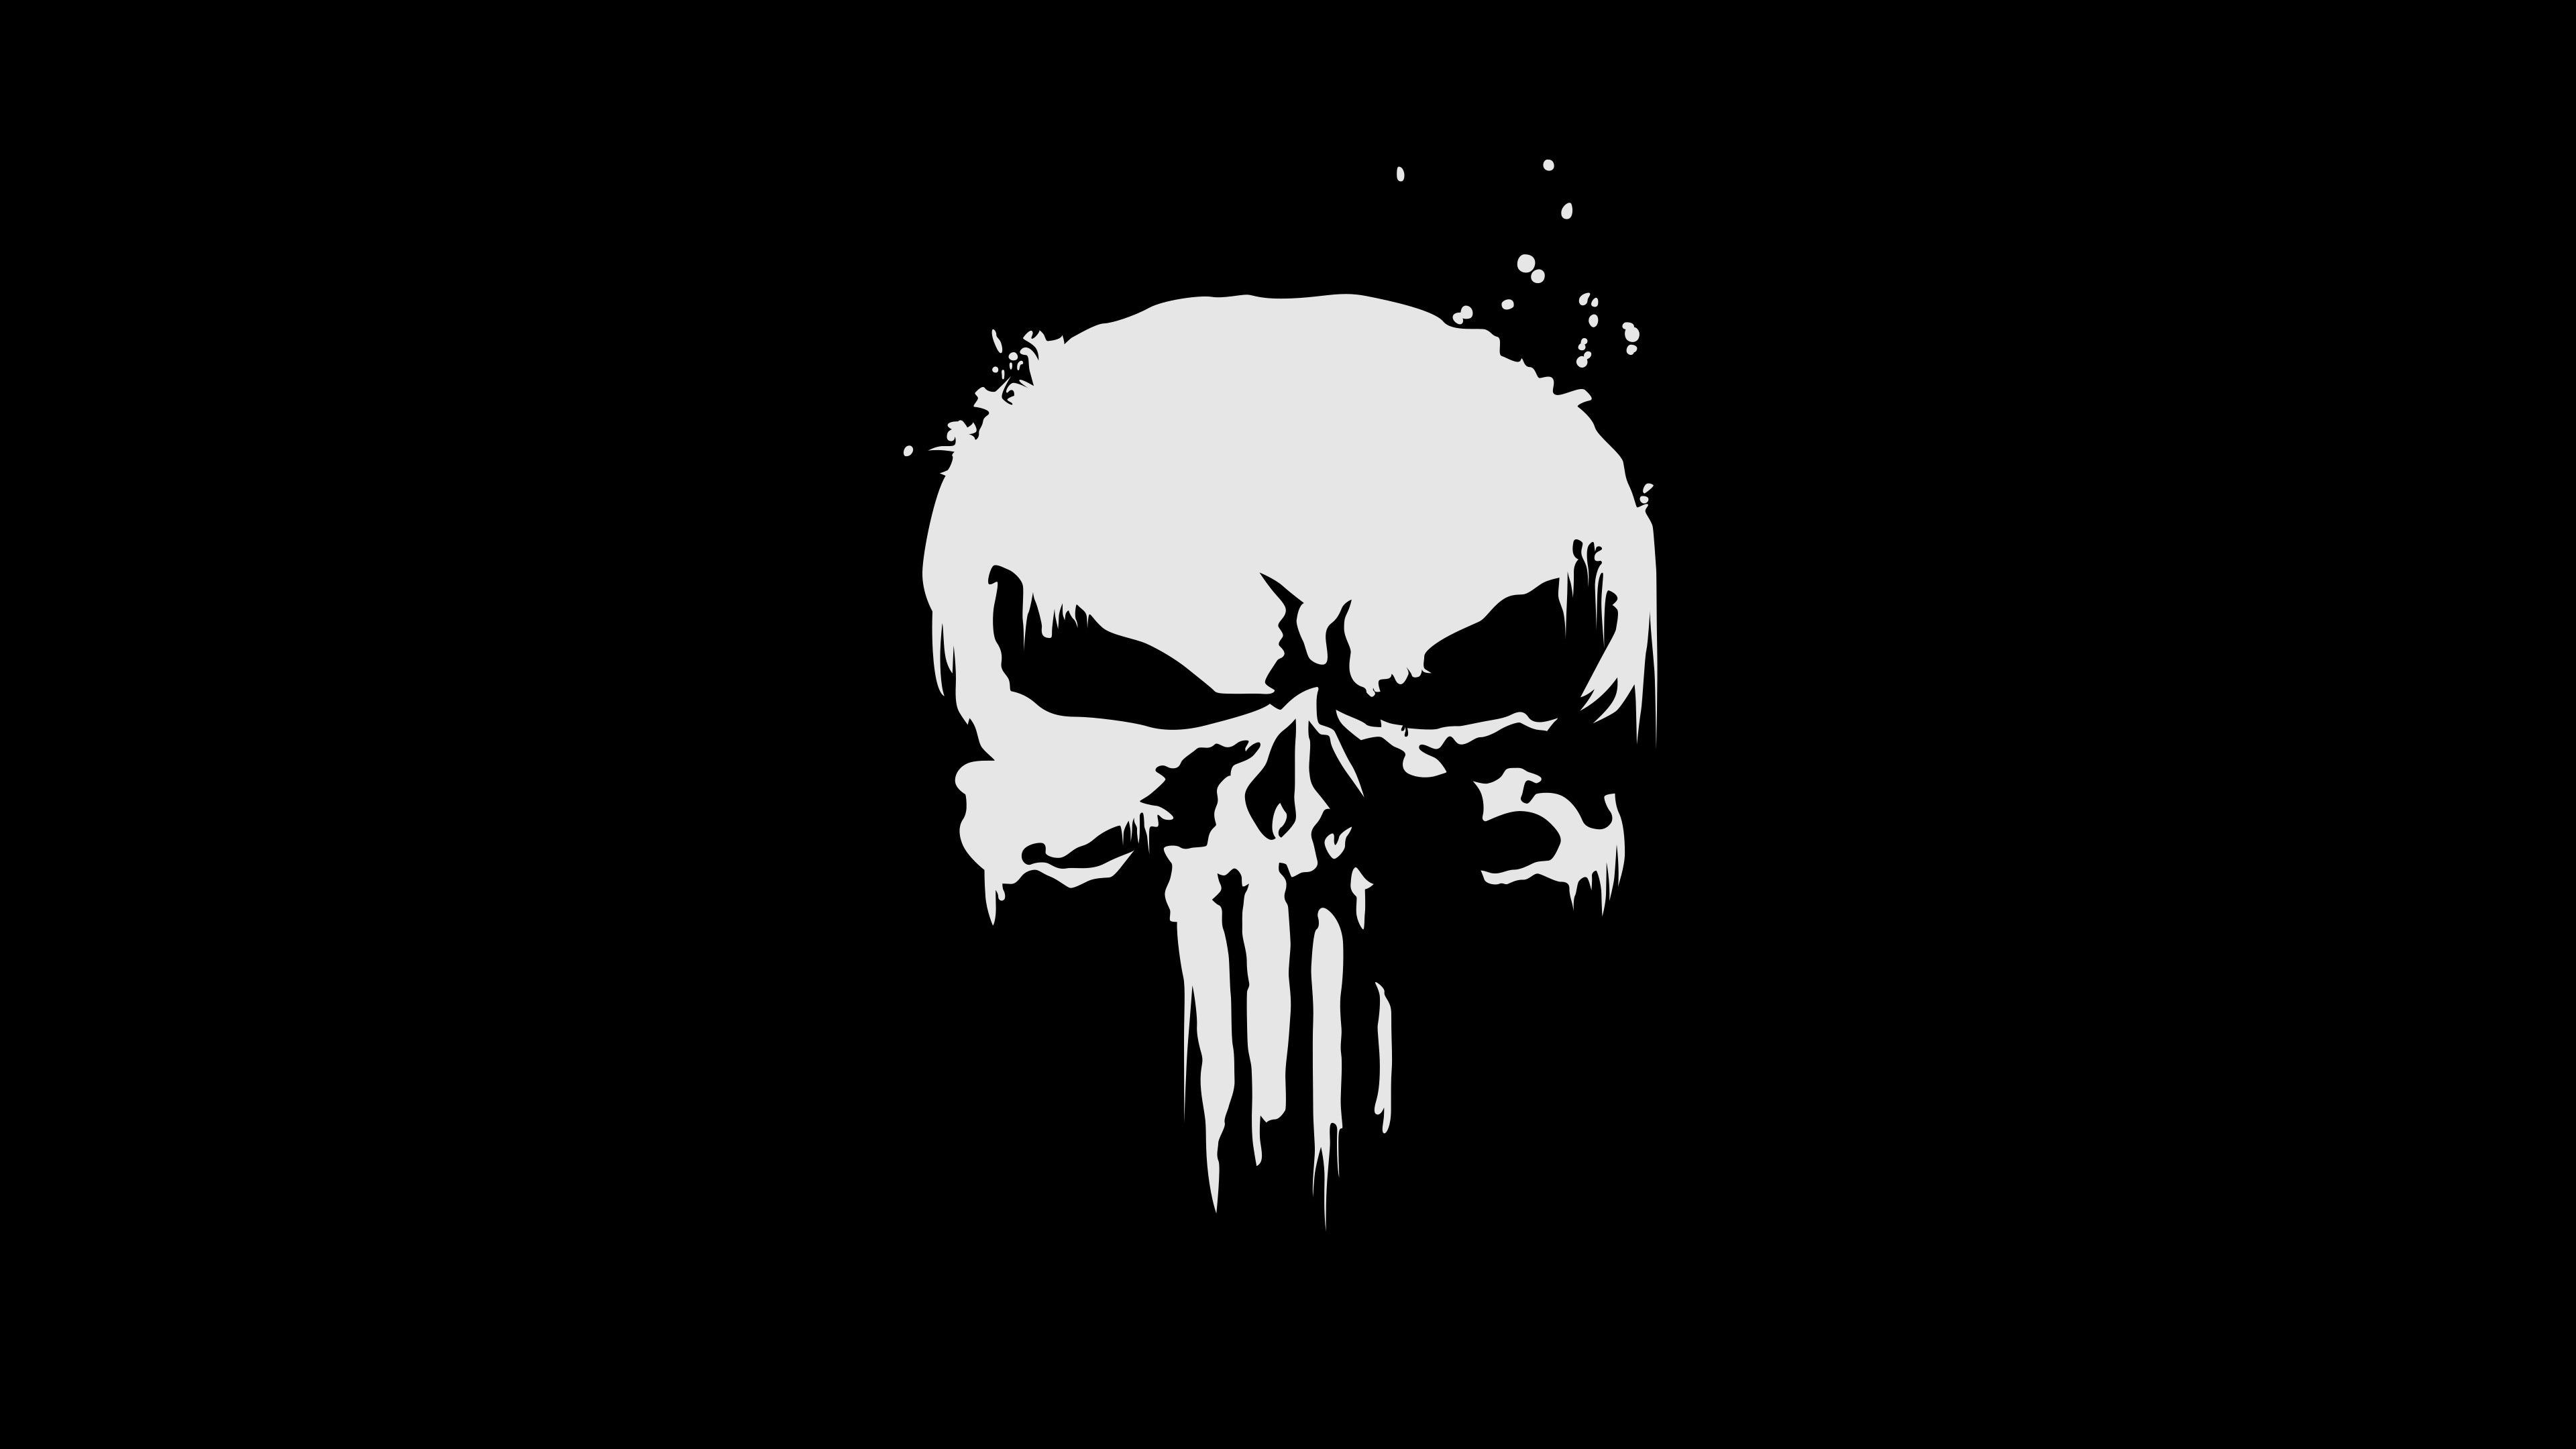 Pubg Logo Texture: Download 3840x2400 Wallpaper The Punisher, Logo, Skull, 4k